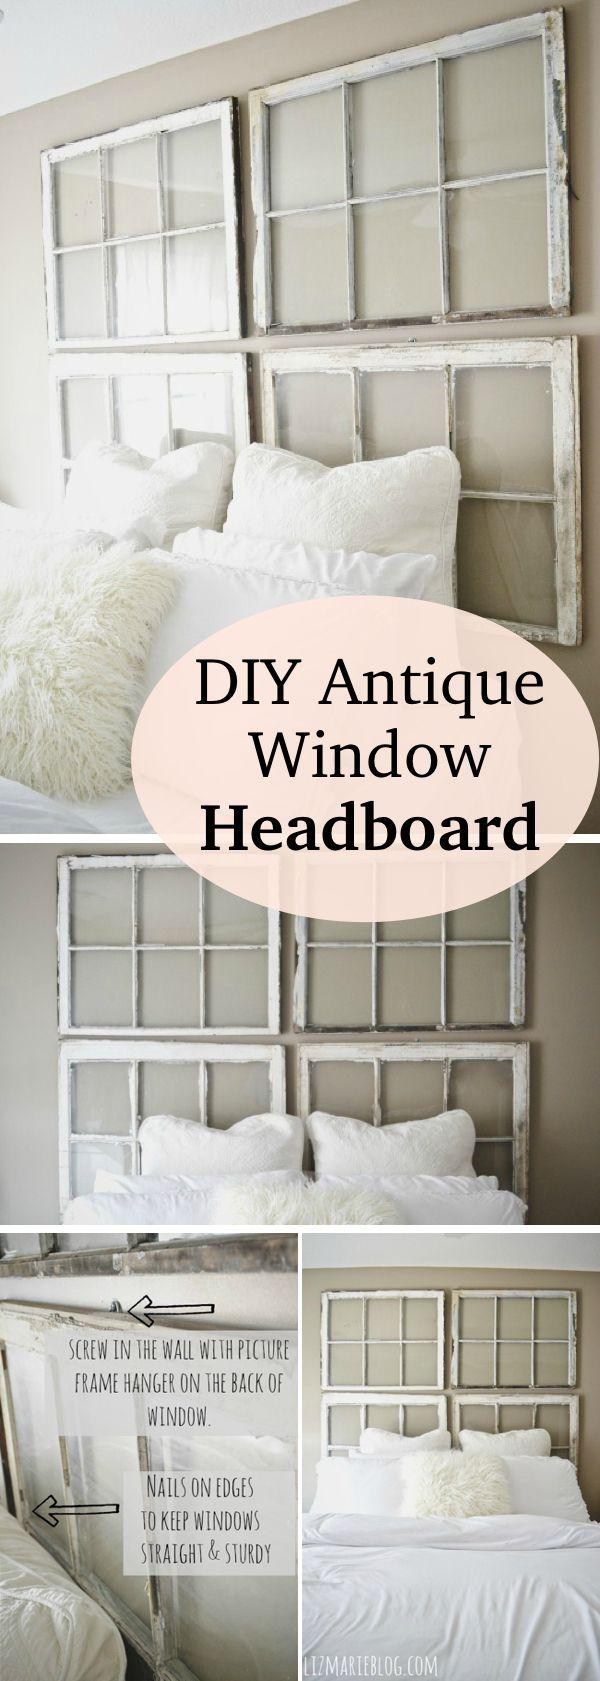 Old window over bed   brilliant ways to repurpose old windows  window headboard